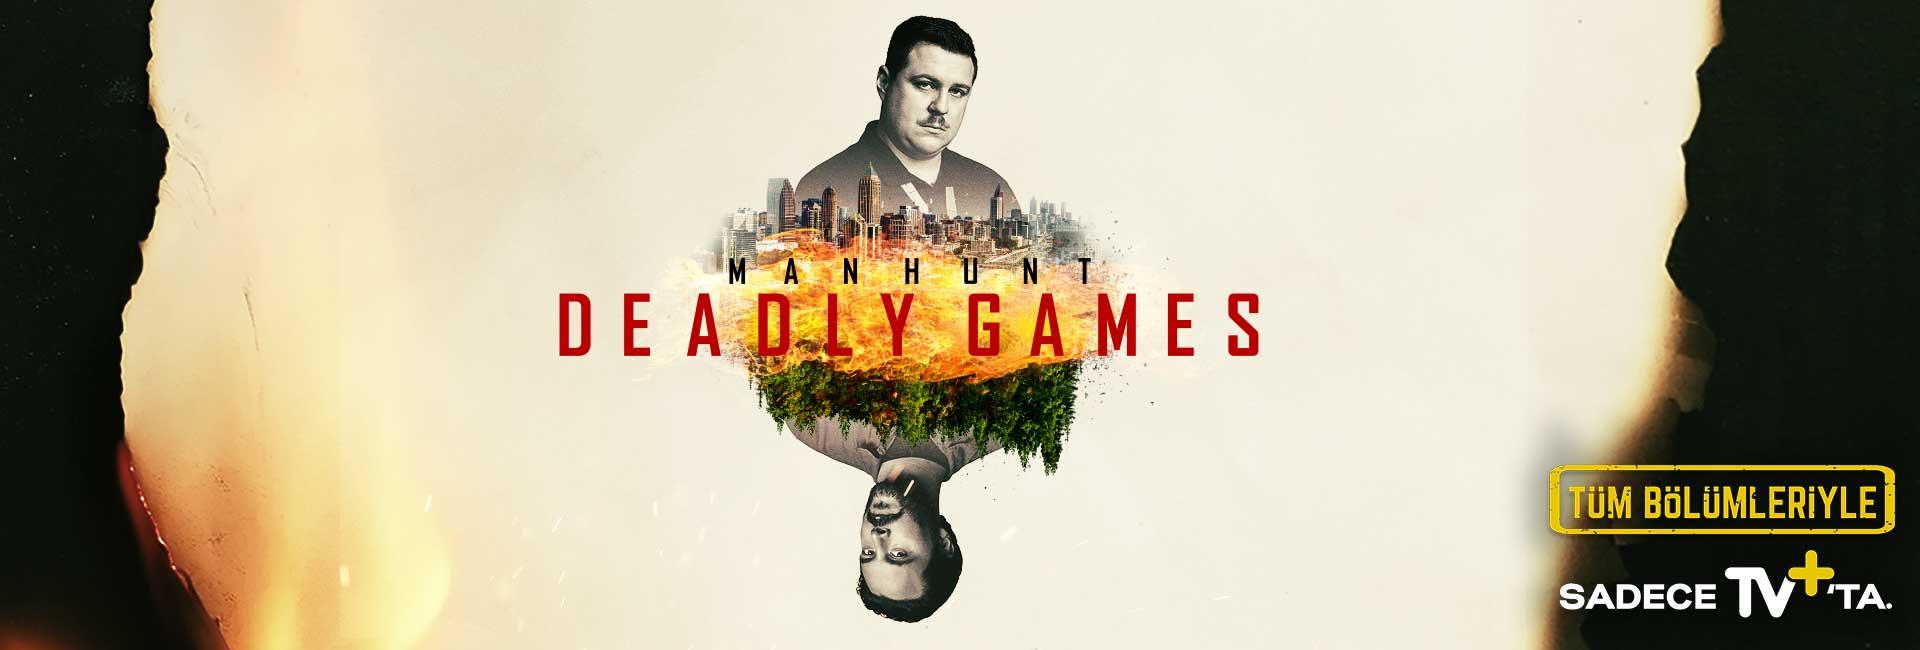 Manhunt Deadly Games